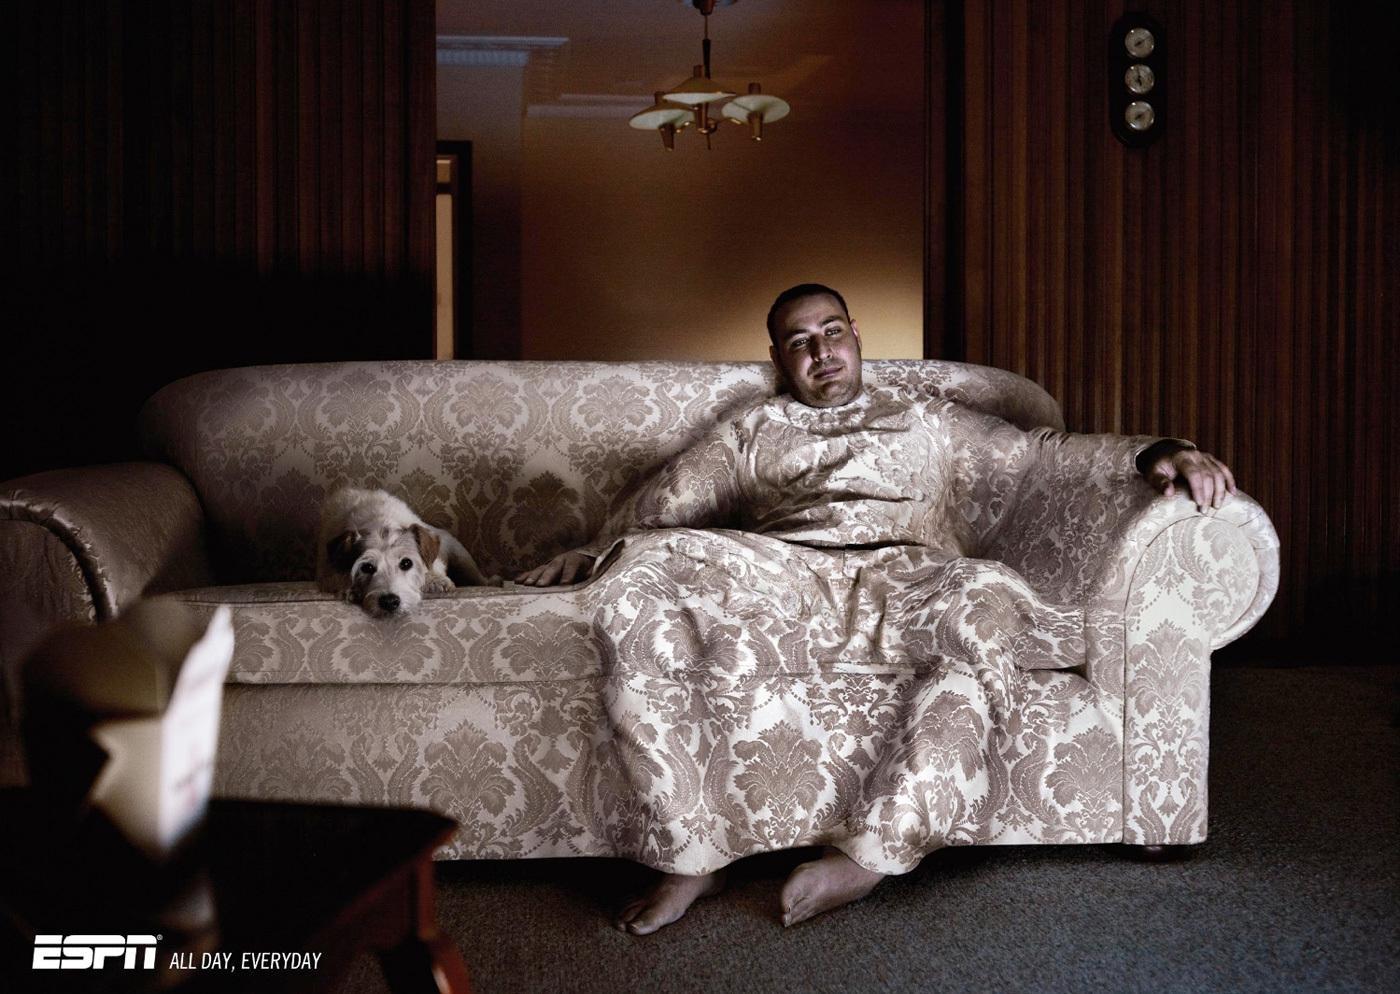 Espn: Brocade Couch – Print (Image) – Creativity Online Regarding Brocade Sofas (Image 15 of 20)